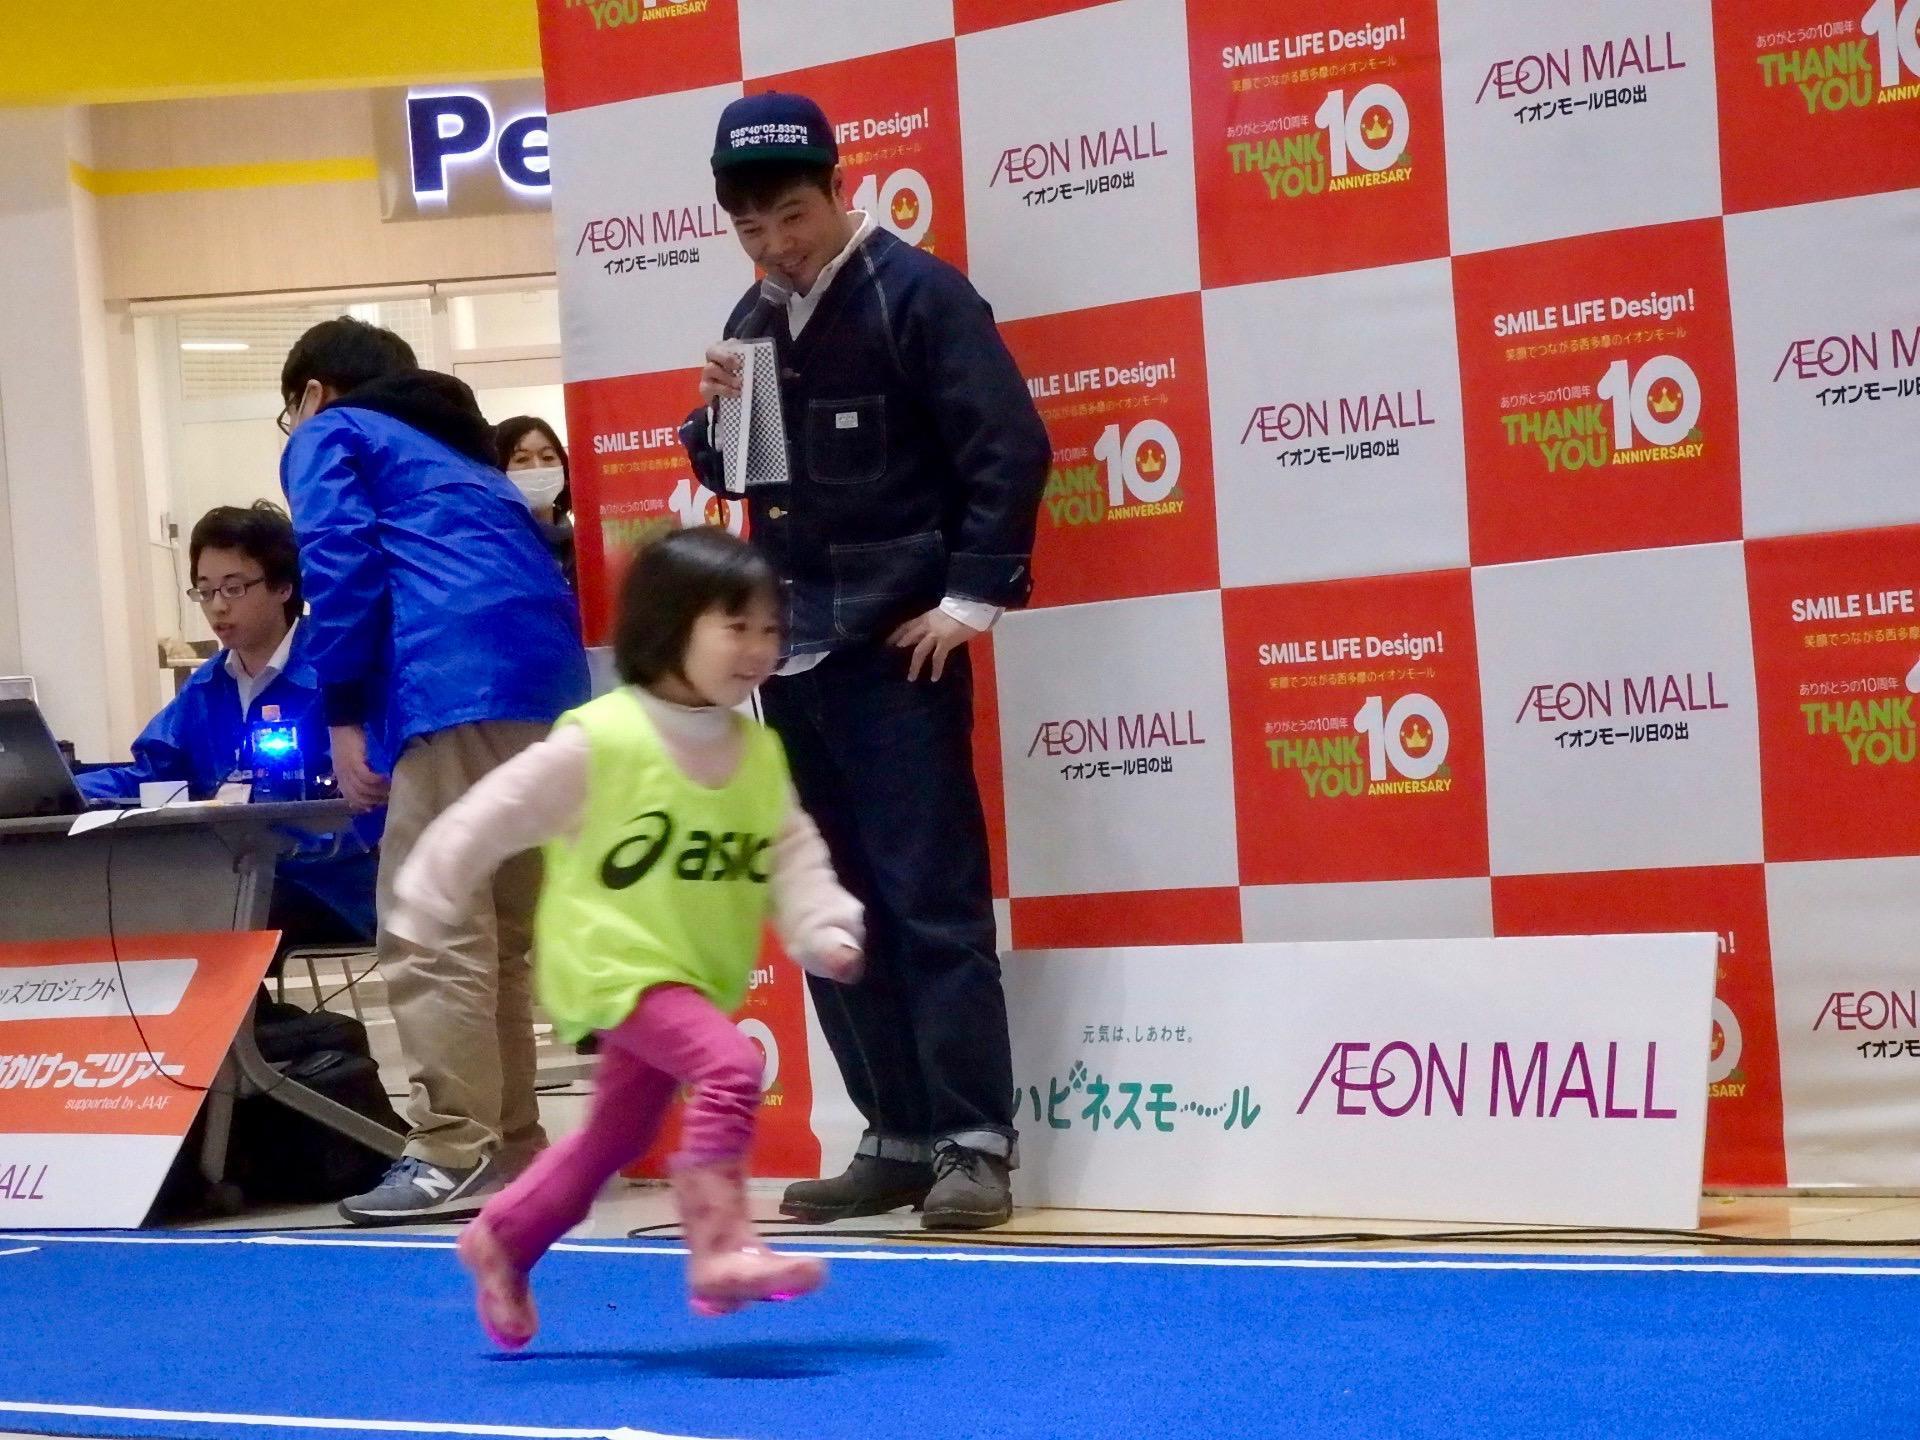 http://news.yoshimoto.co.jp/20180211195400-5e507098075c50037965c798abcf668c33baa766.jpg